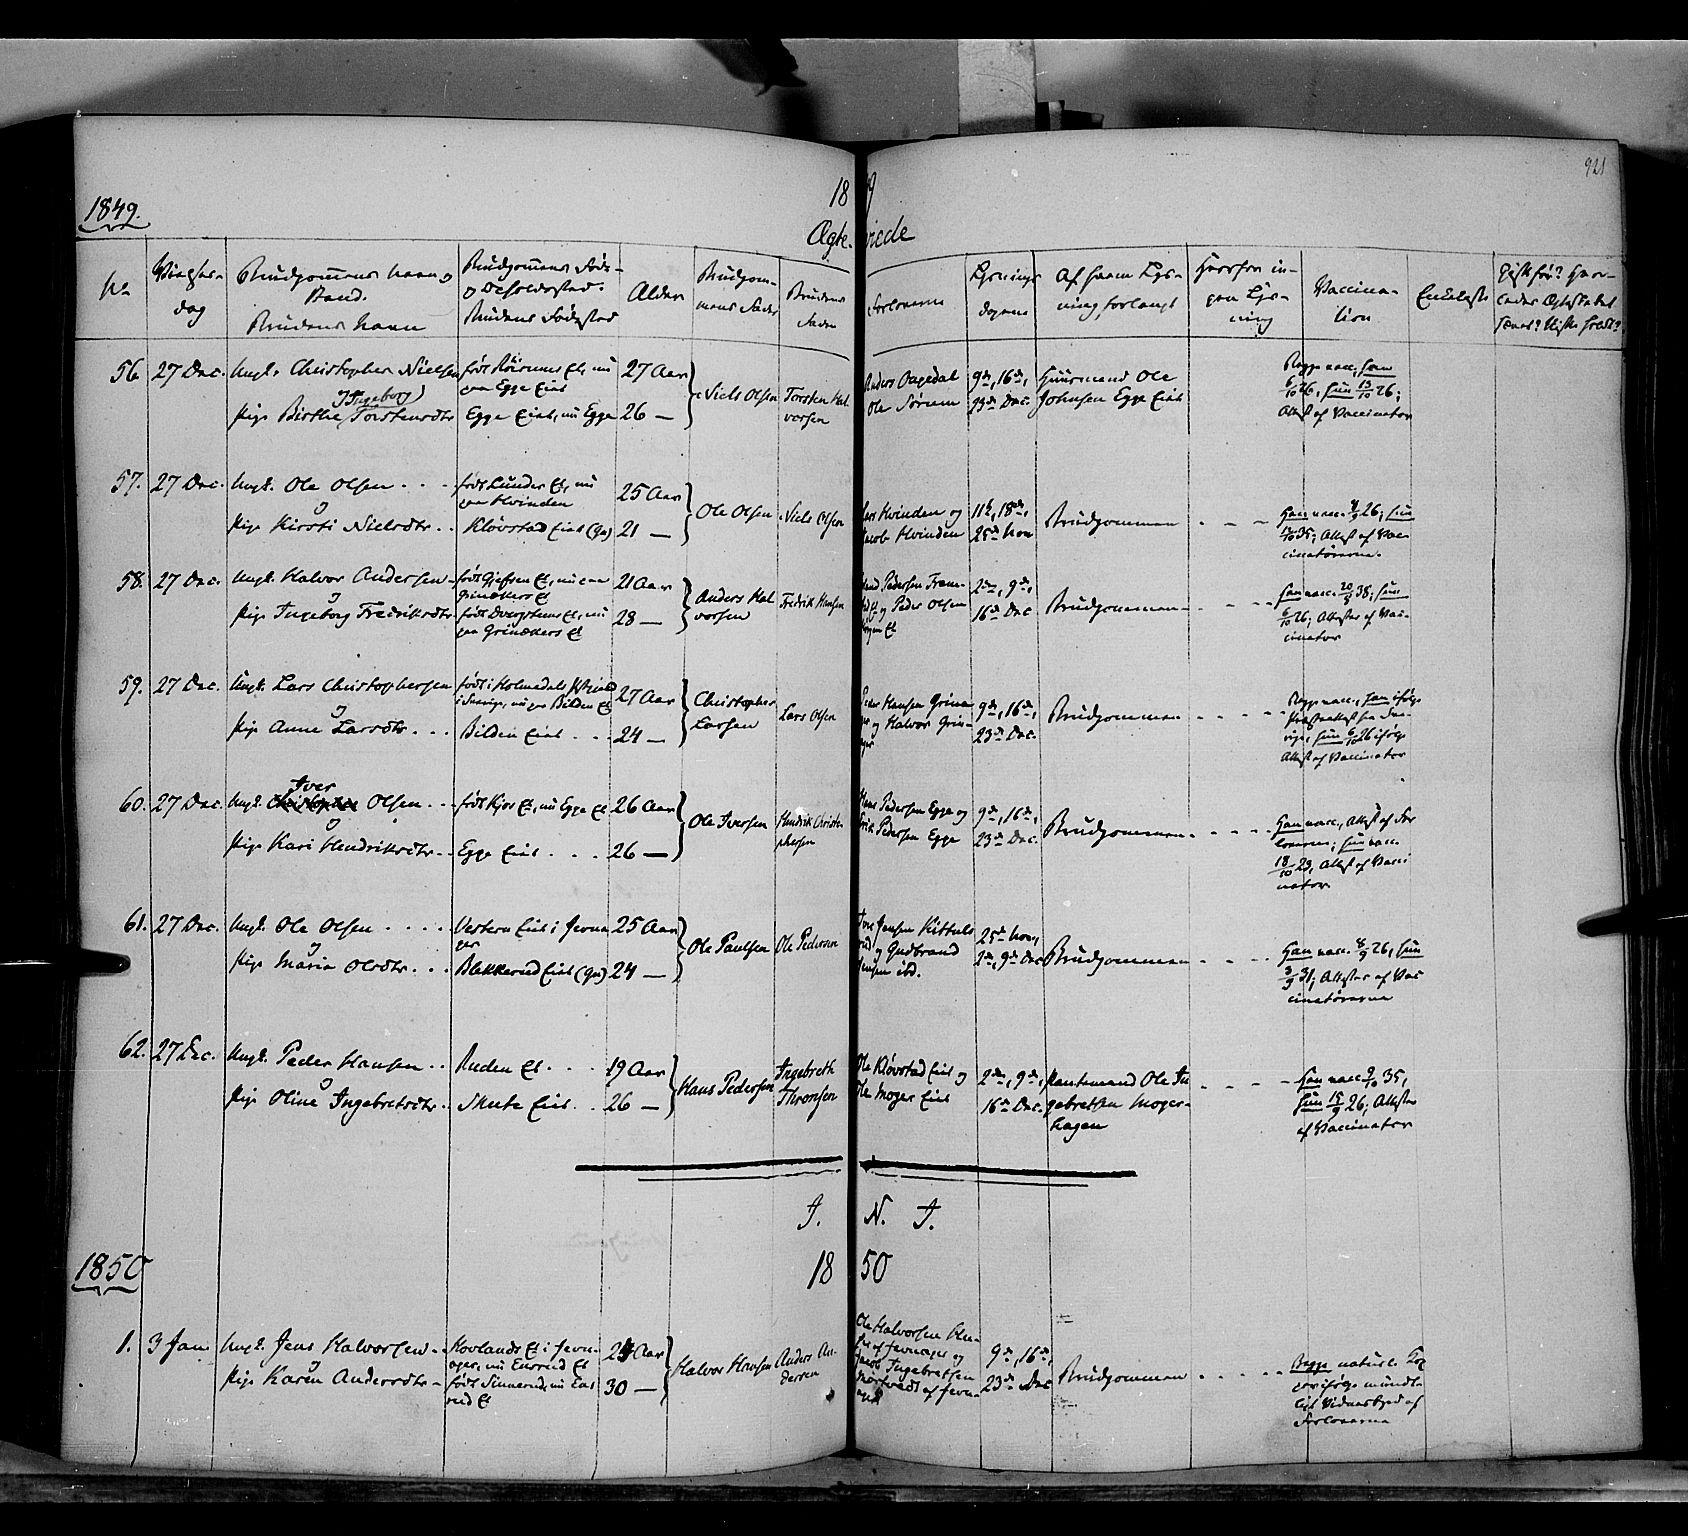 SAH, Gran prestekontor, Ministerialbok nr. 11, 1842-1856, s. 920-921